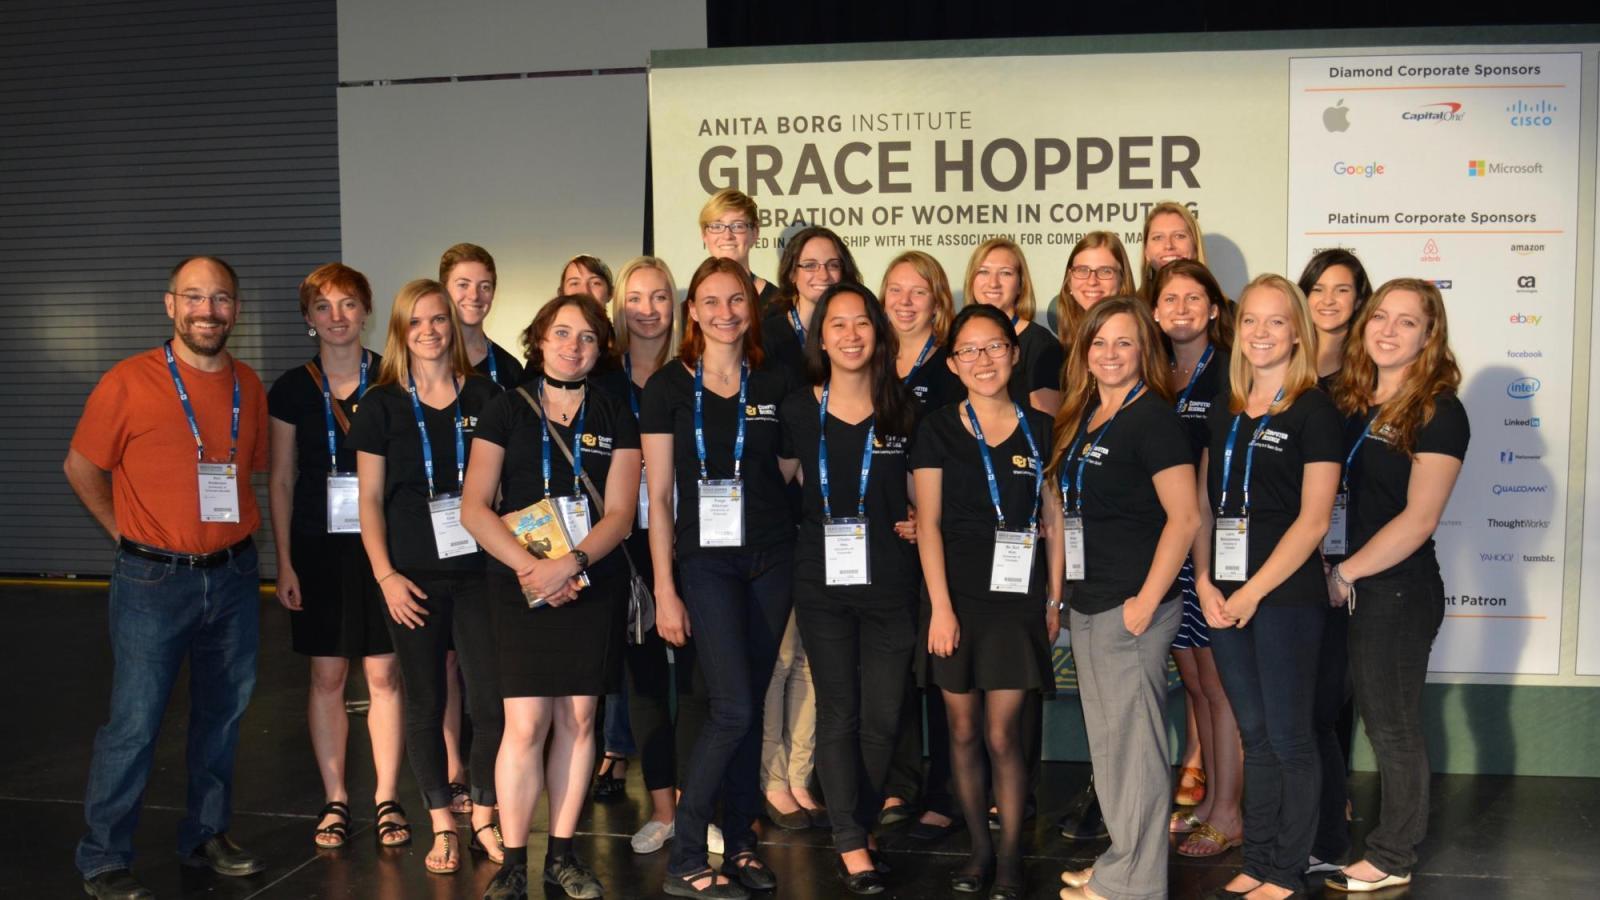 Grace Hopper Conference Photo